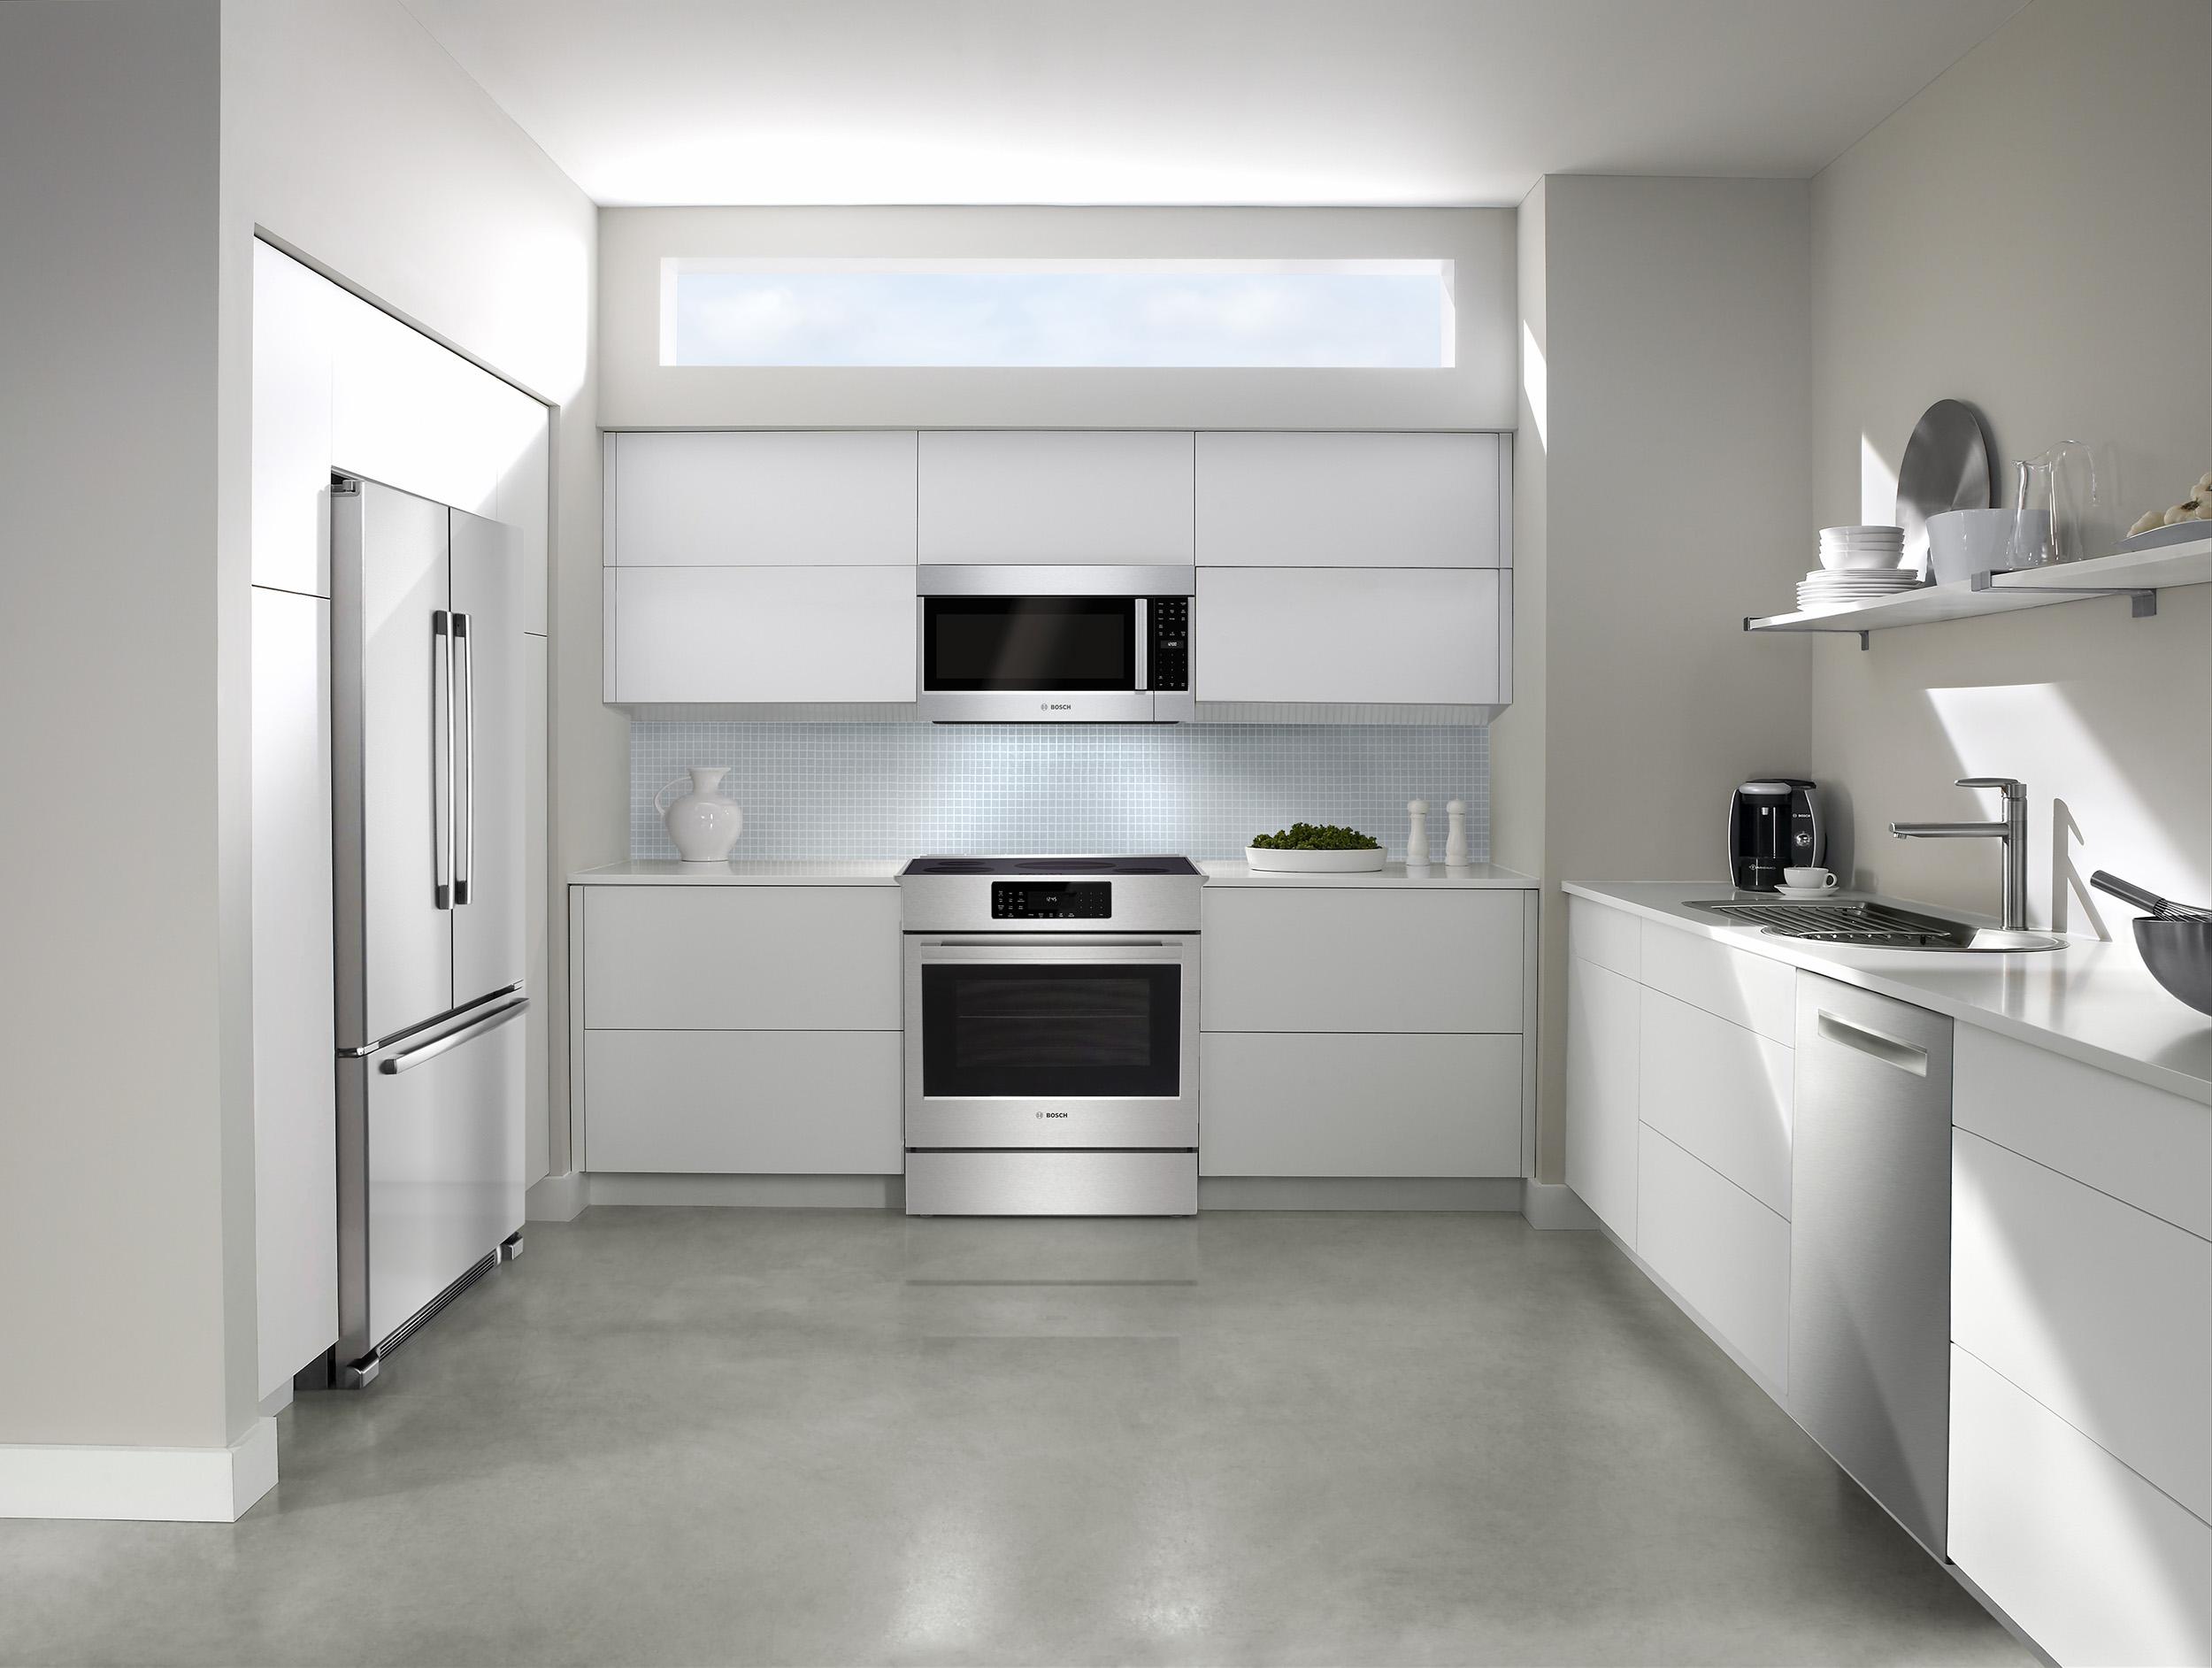 bosch kitchen white modern cabinets appliances calgary alberta kuchen benchmark